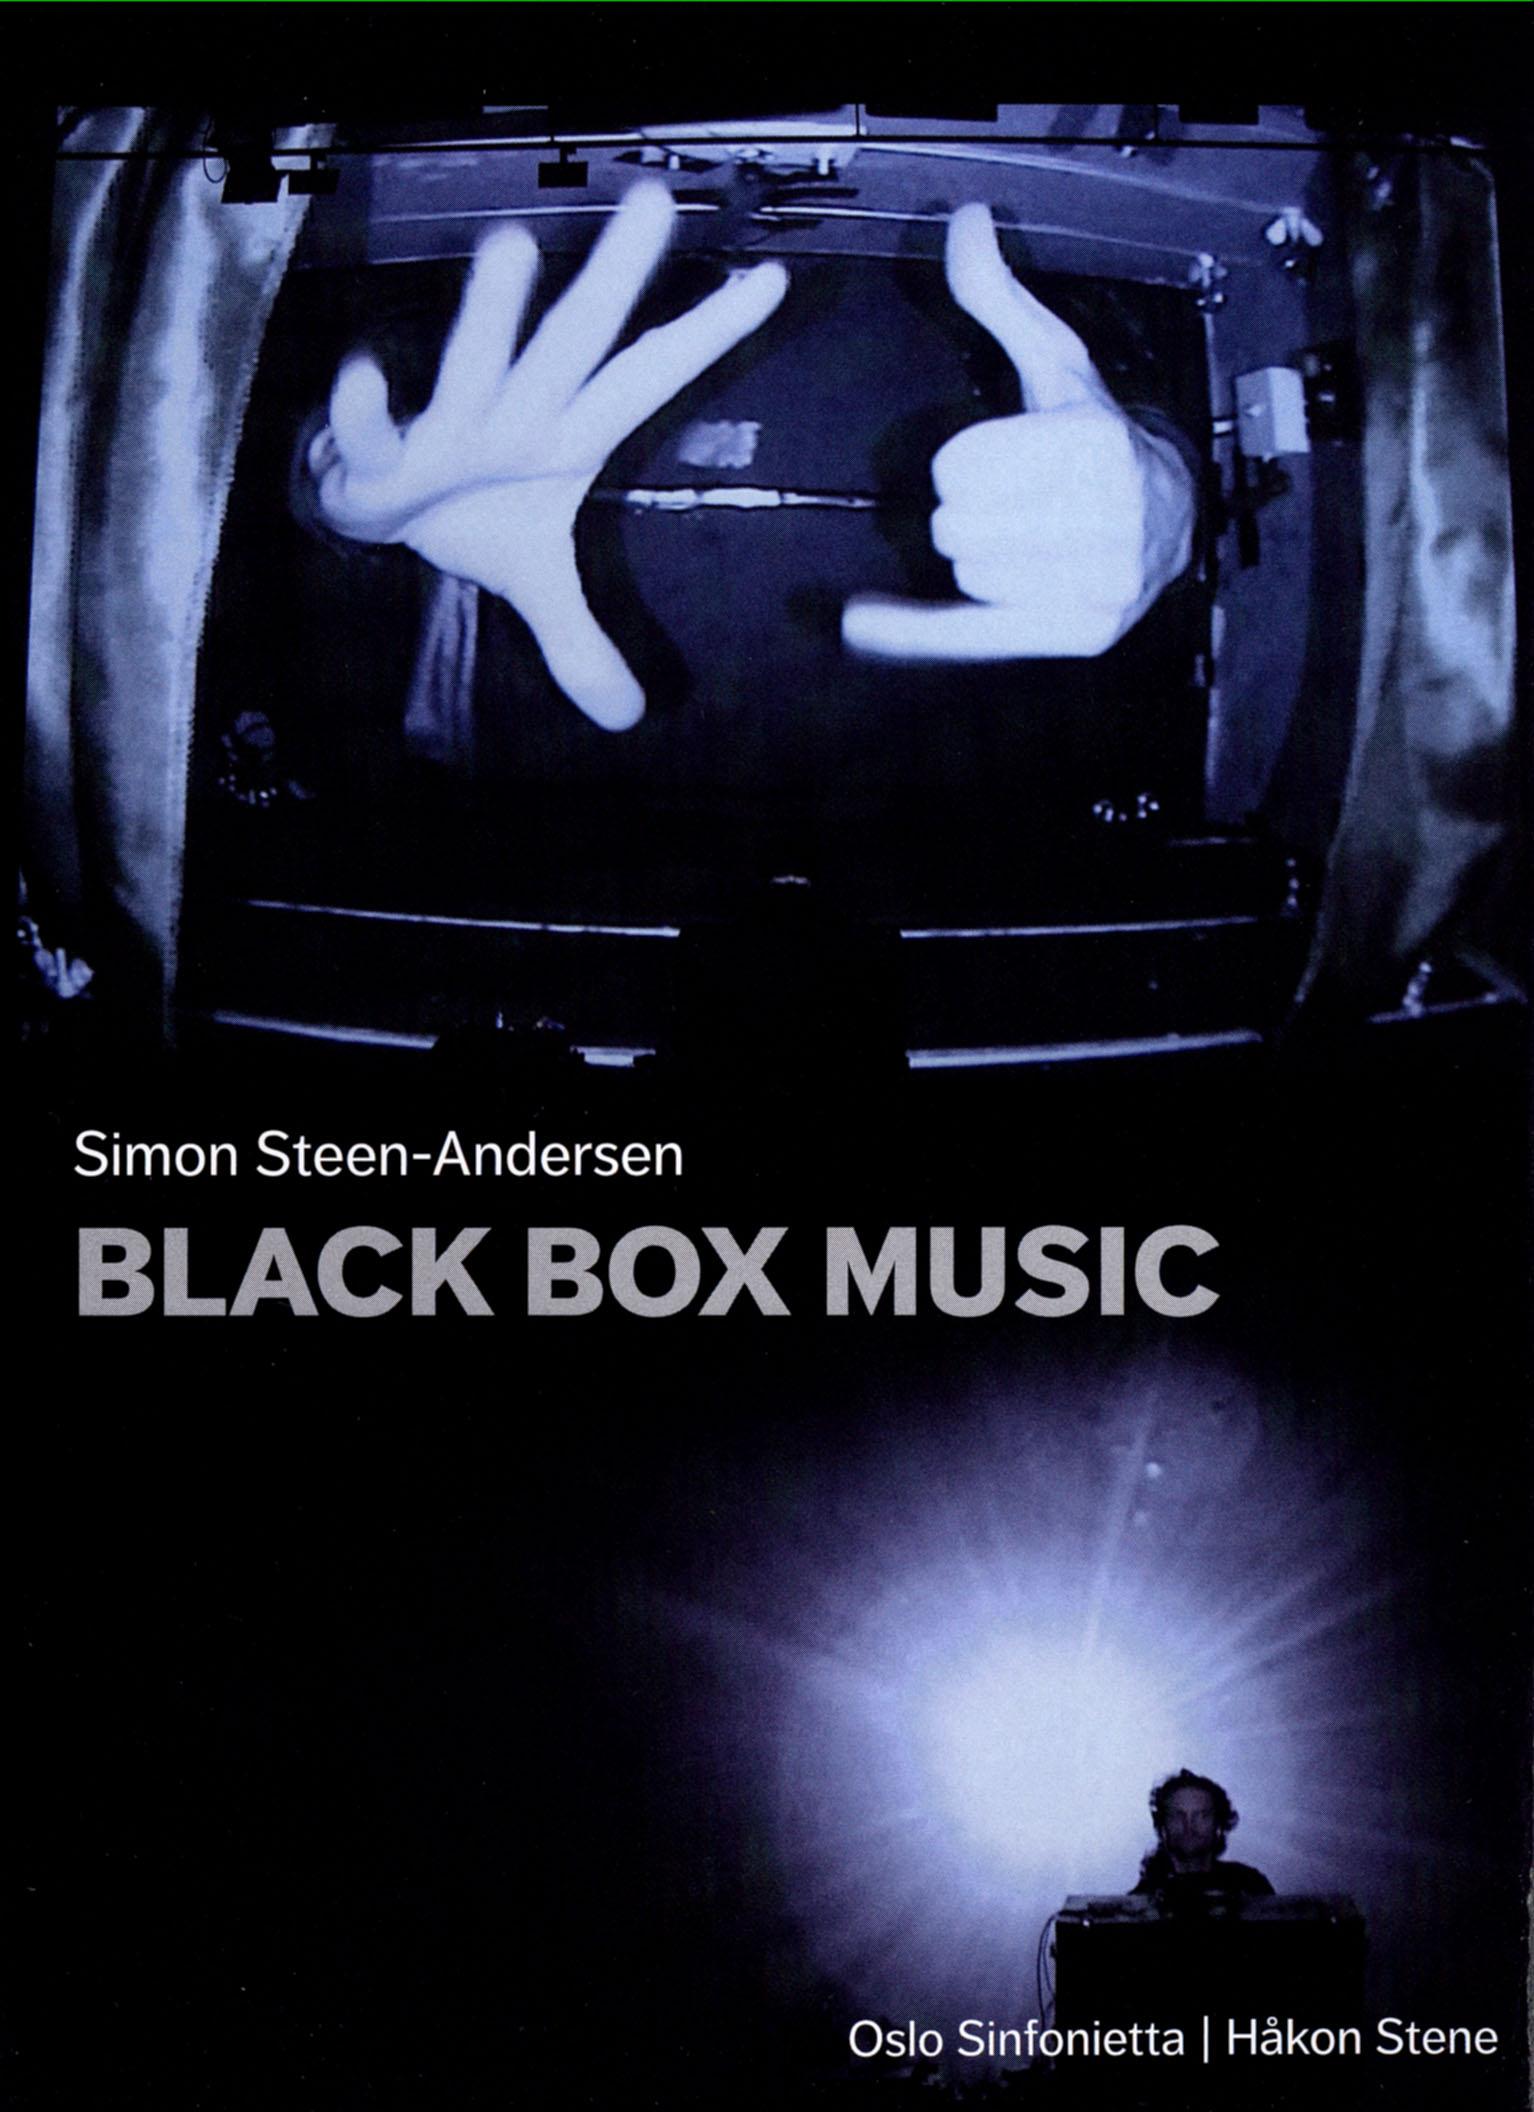 Oslo Sinfonietta/Håkon Stene: Simon Steen-Andersen - Black Box Music